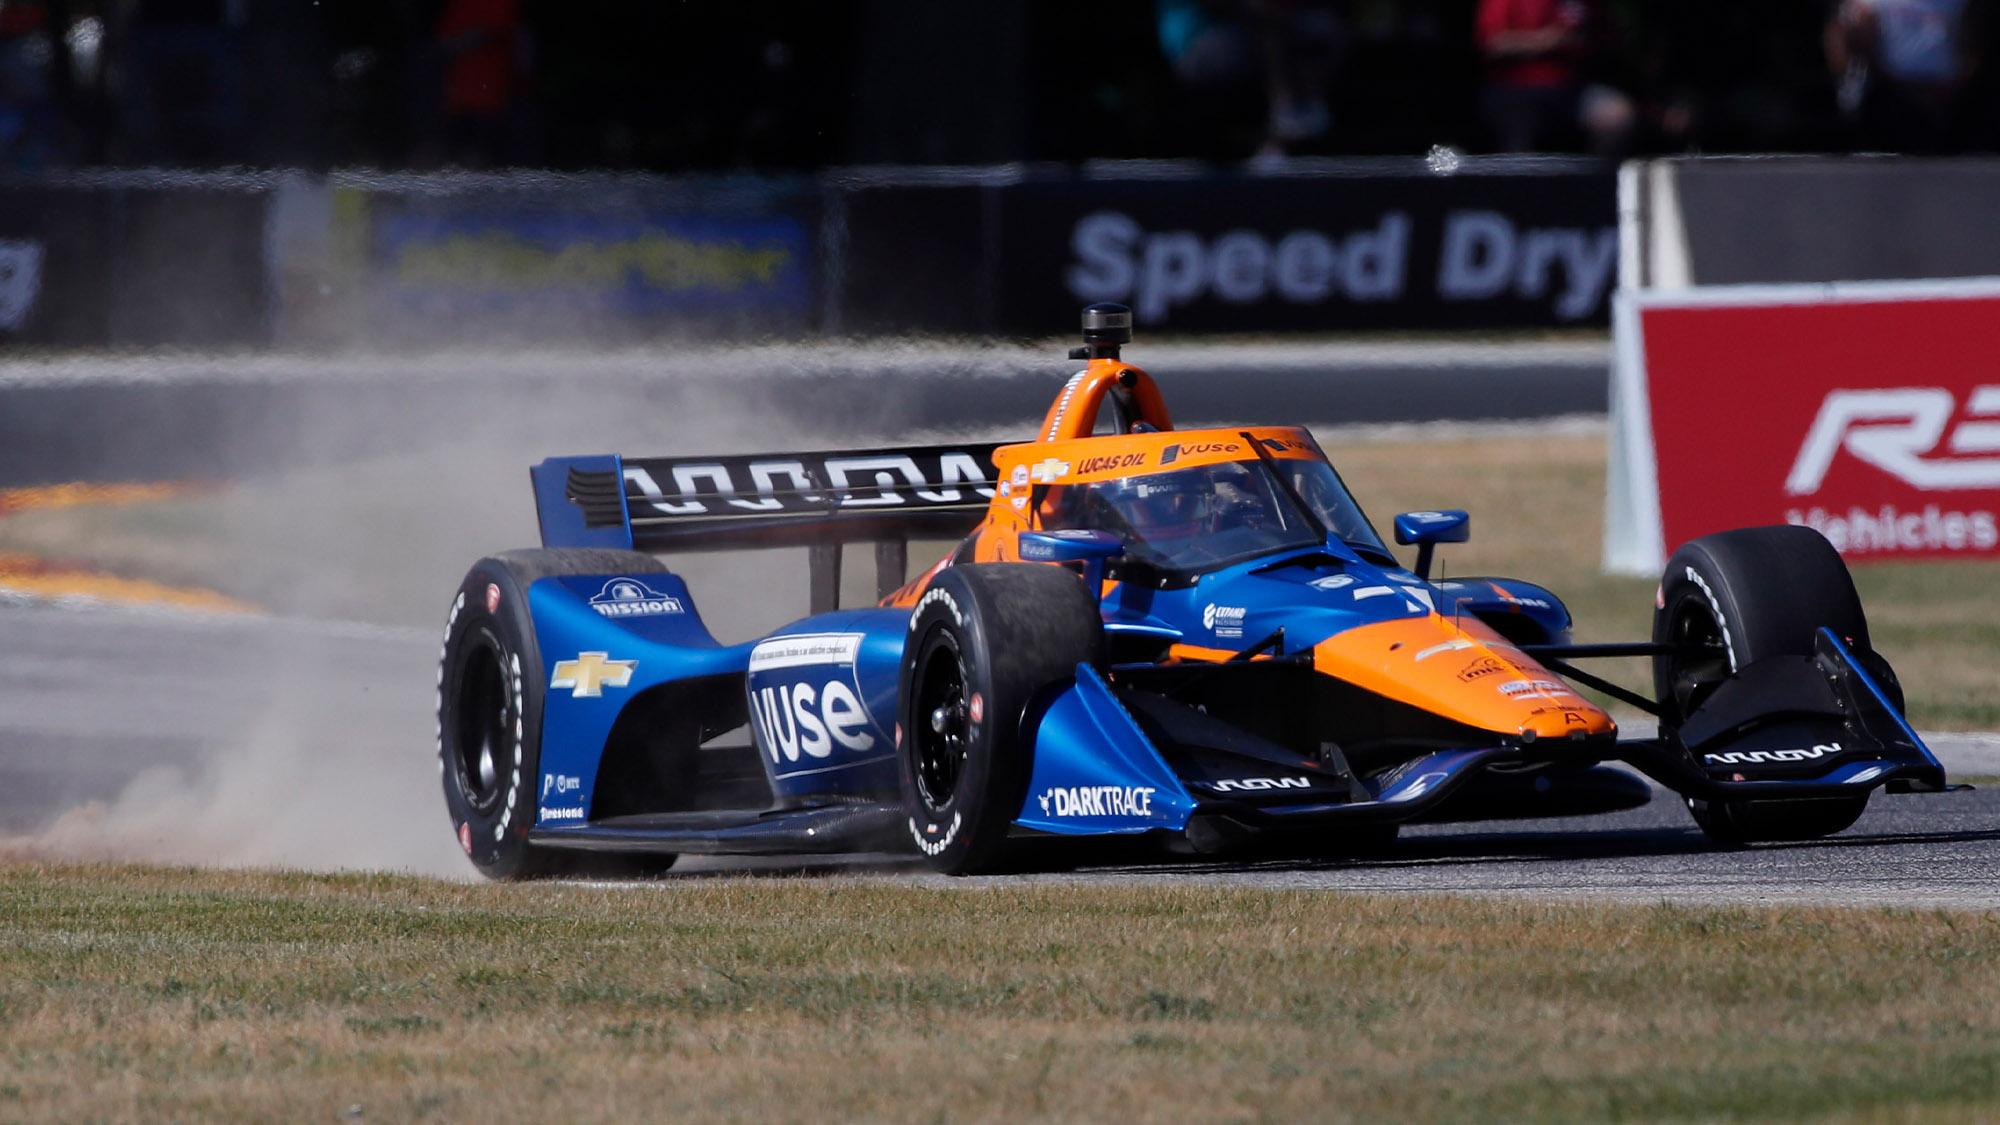 Kevin Magnussen locks up Arrow McLaren IndyCar at Road America in 2021